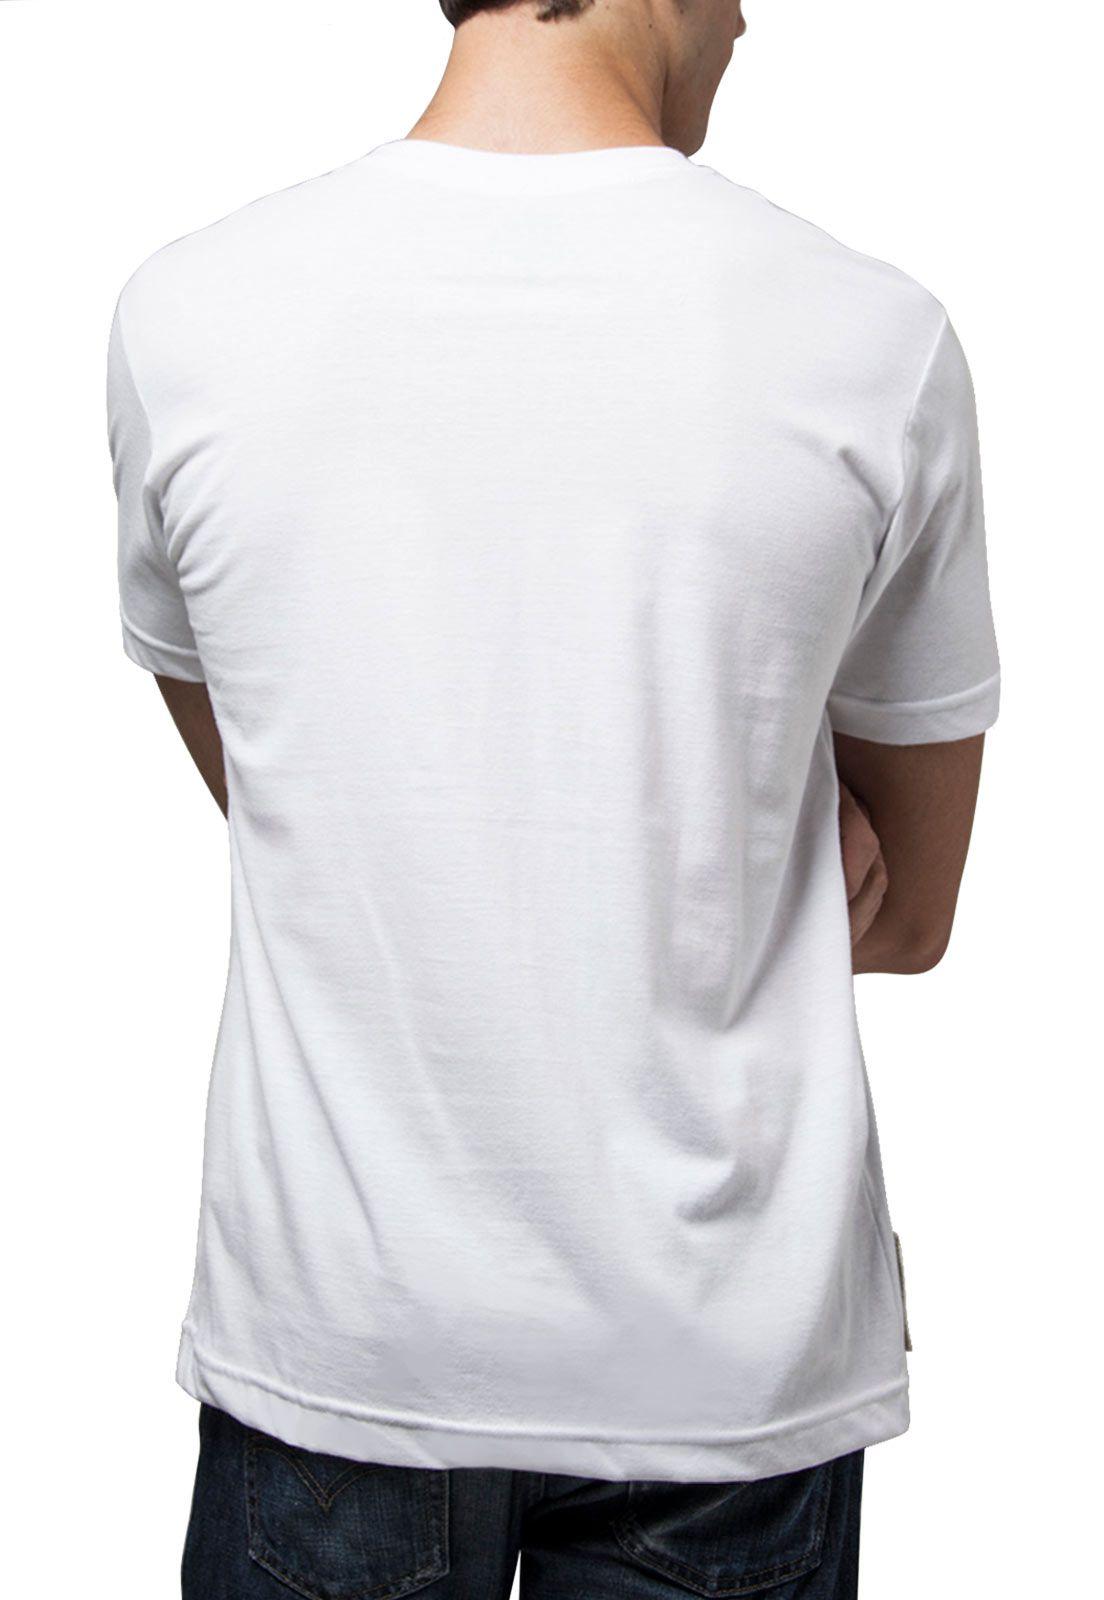 Camiseta Amazônia Ama zo ni a - Branco